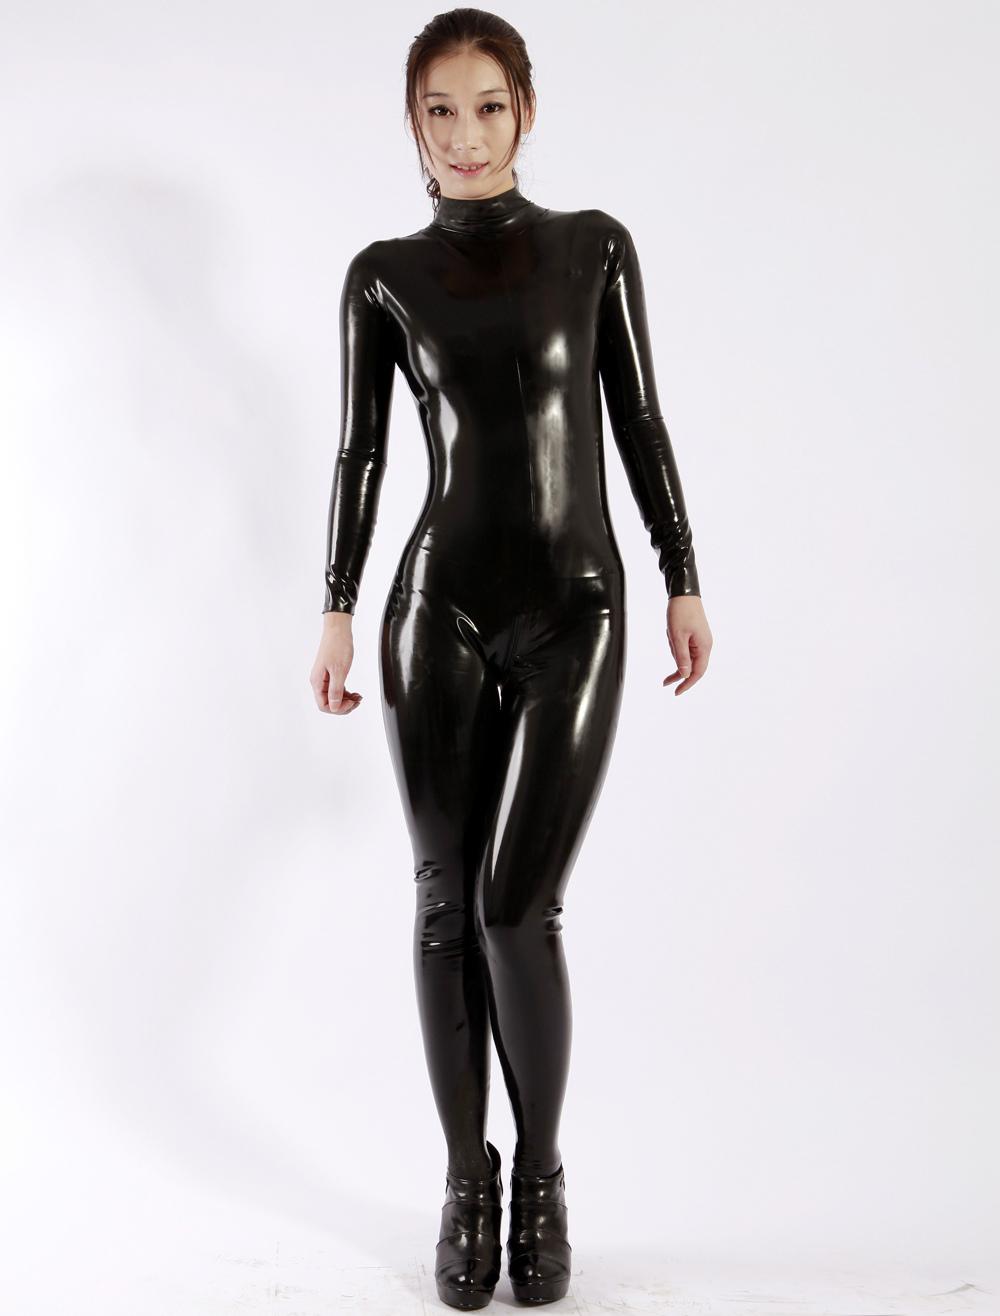 53dff6cd6ab1 Latex Catsuits Black Unisex Halloween Bodysuit Halloween - Milanoo.com